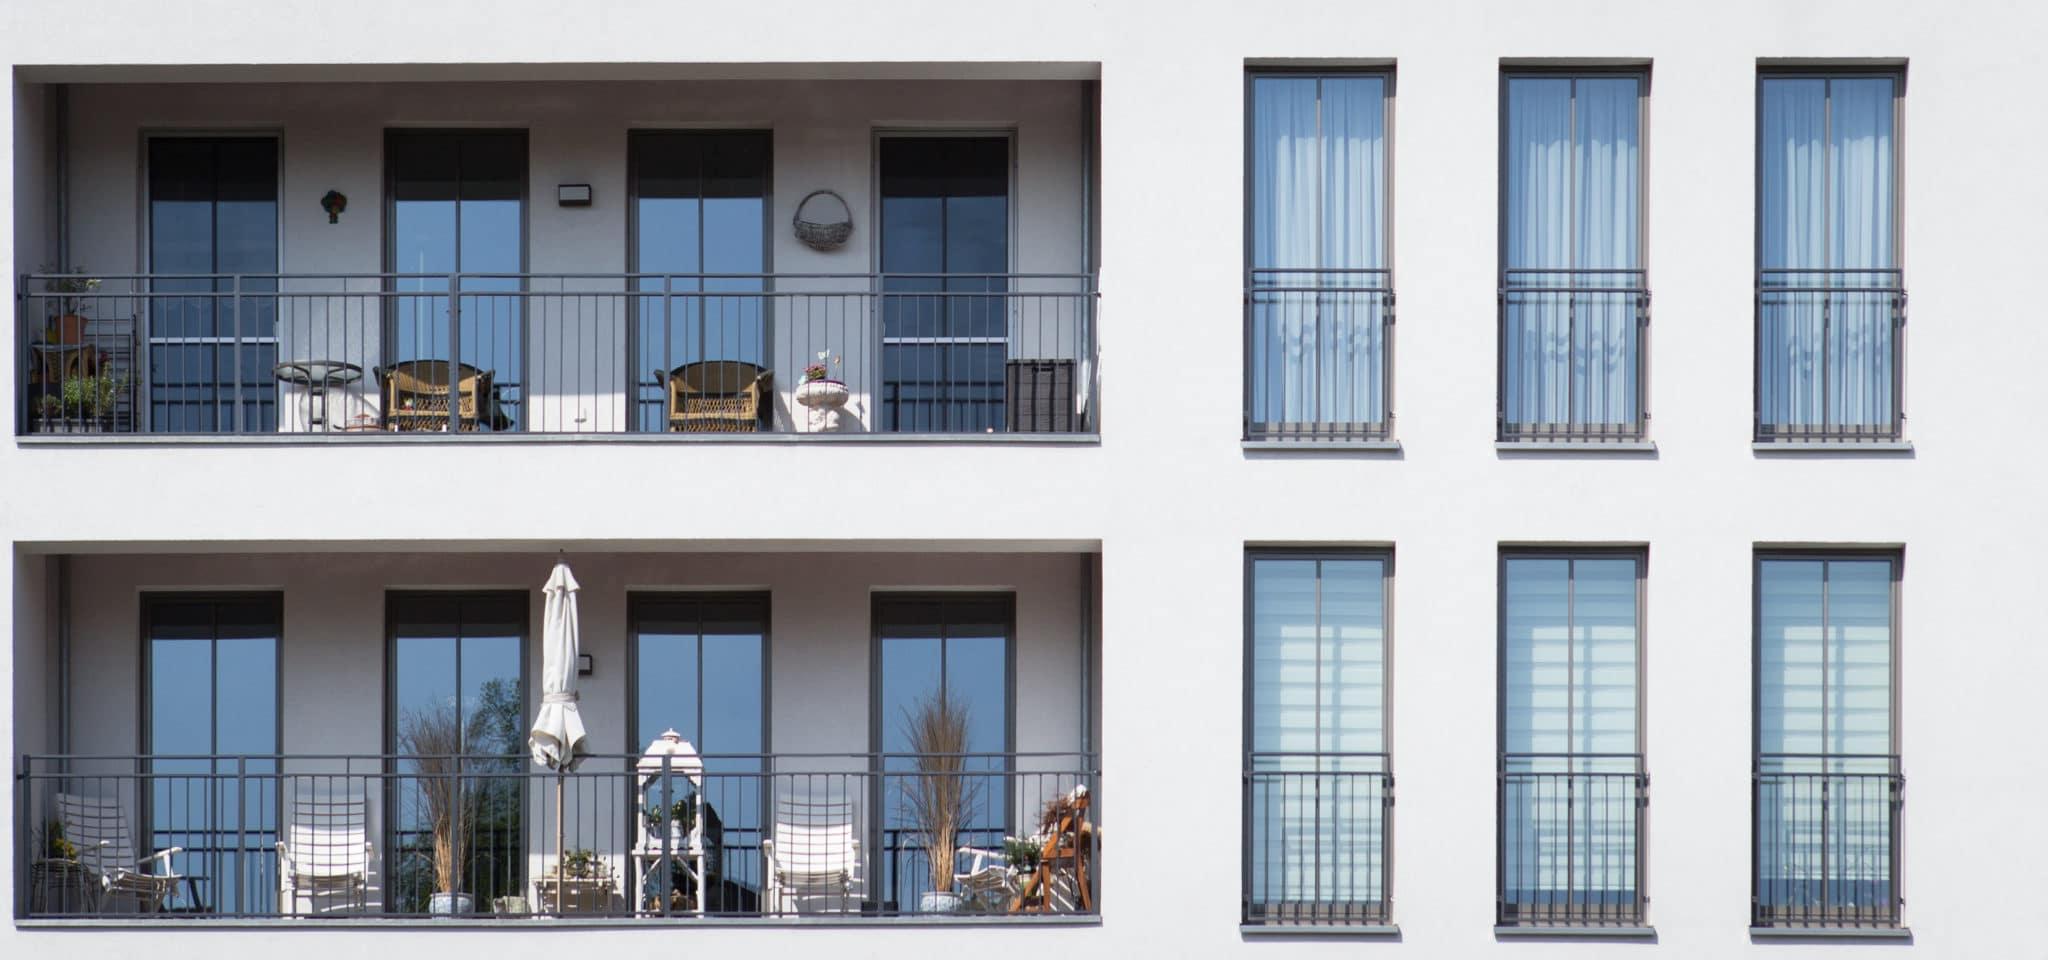 Berlin, Immobilie, Haus, Wohnung